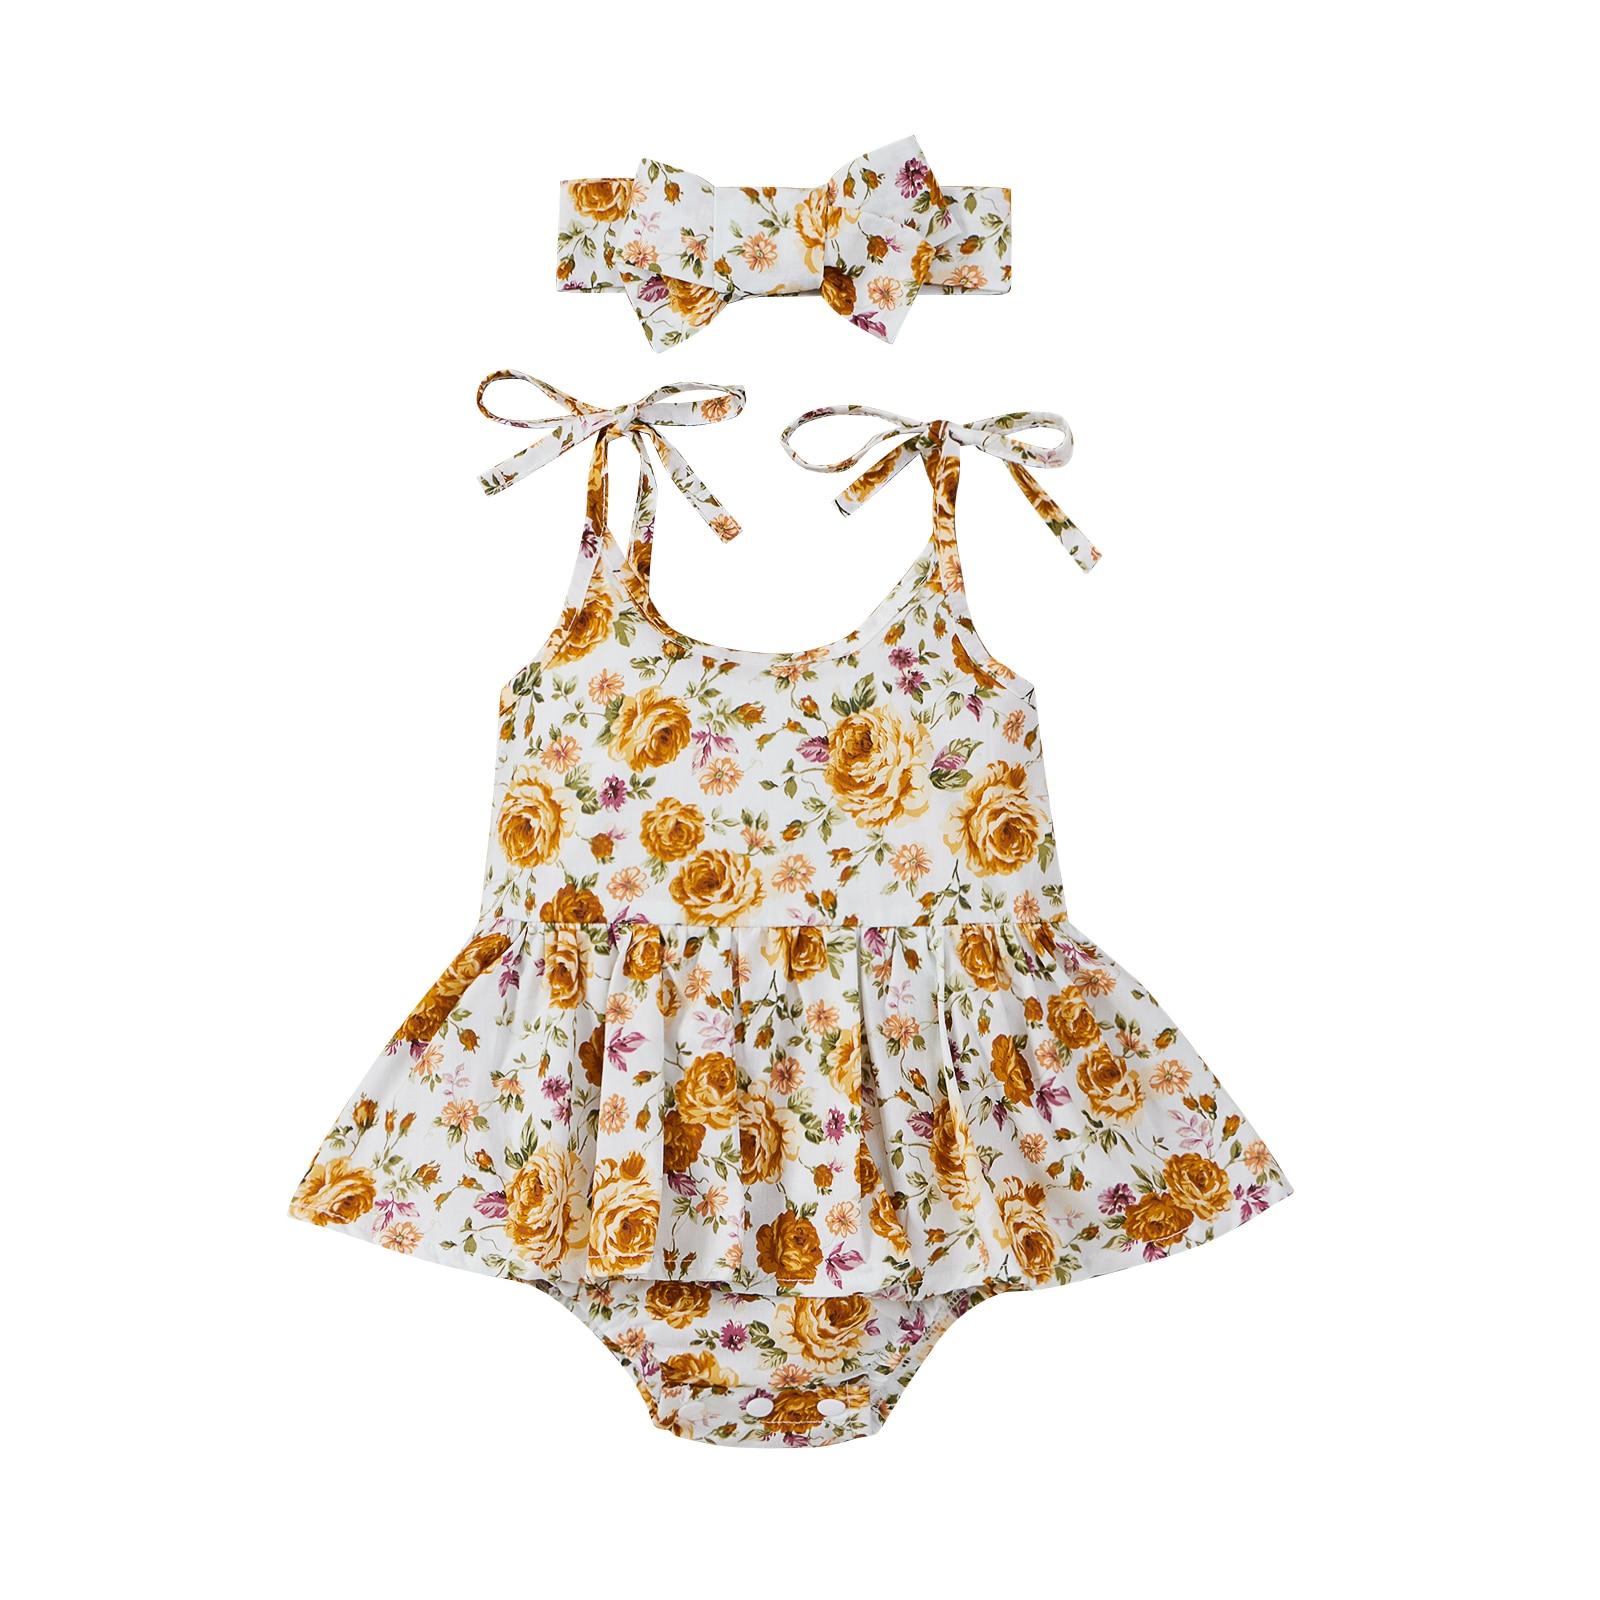 OPPERIAYA Baby Girls Summer Outfits Ruffle Cute Self Tie Strap Sleeveless Floral Tutu Bodysuit with Bow Headband Casual Set self tie ruffle bikini set